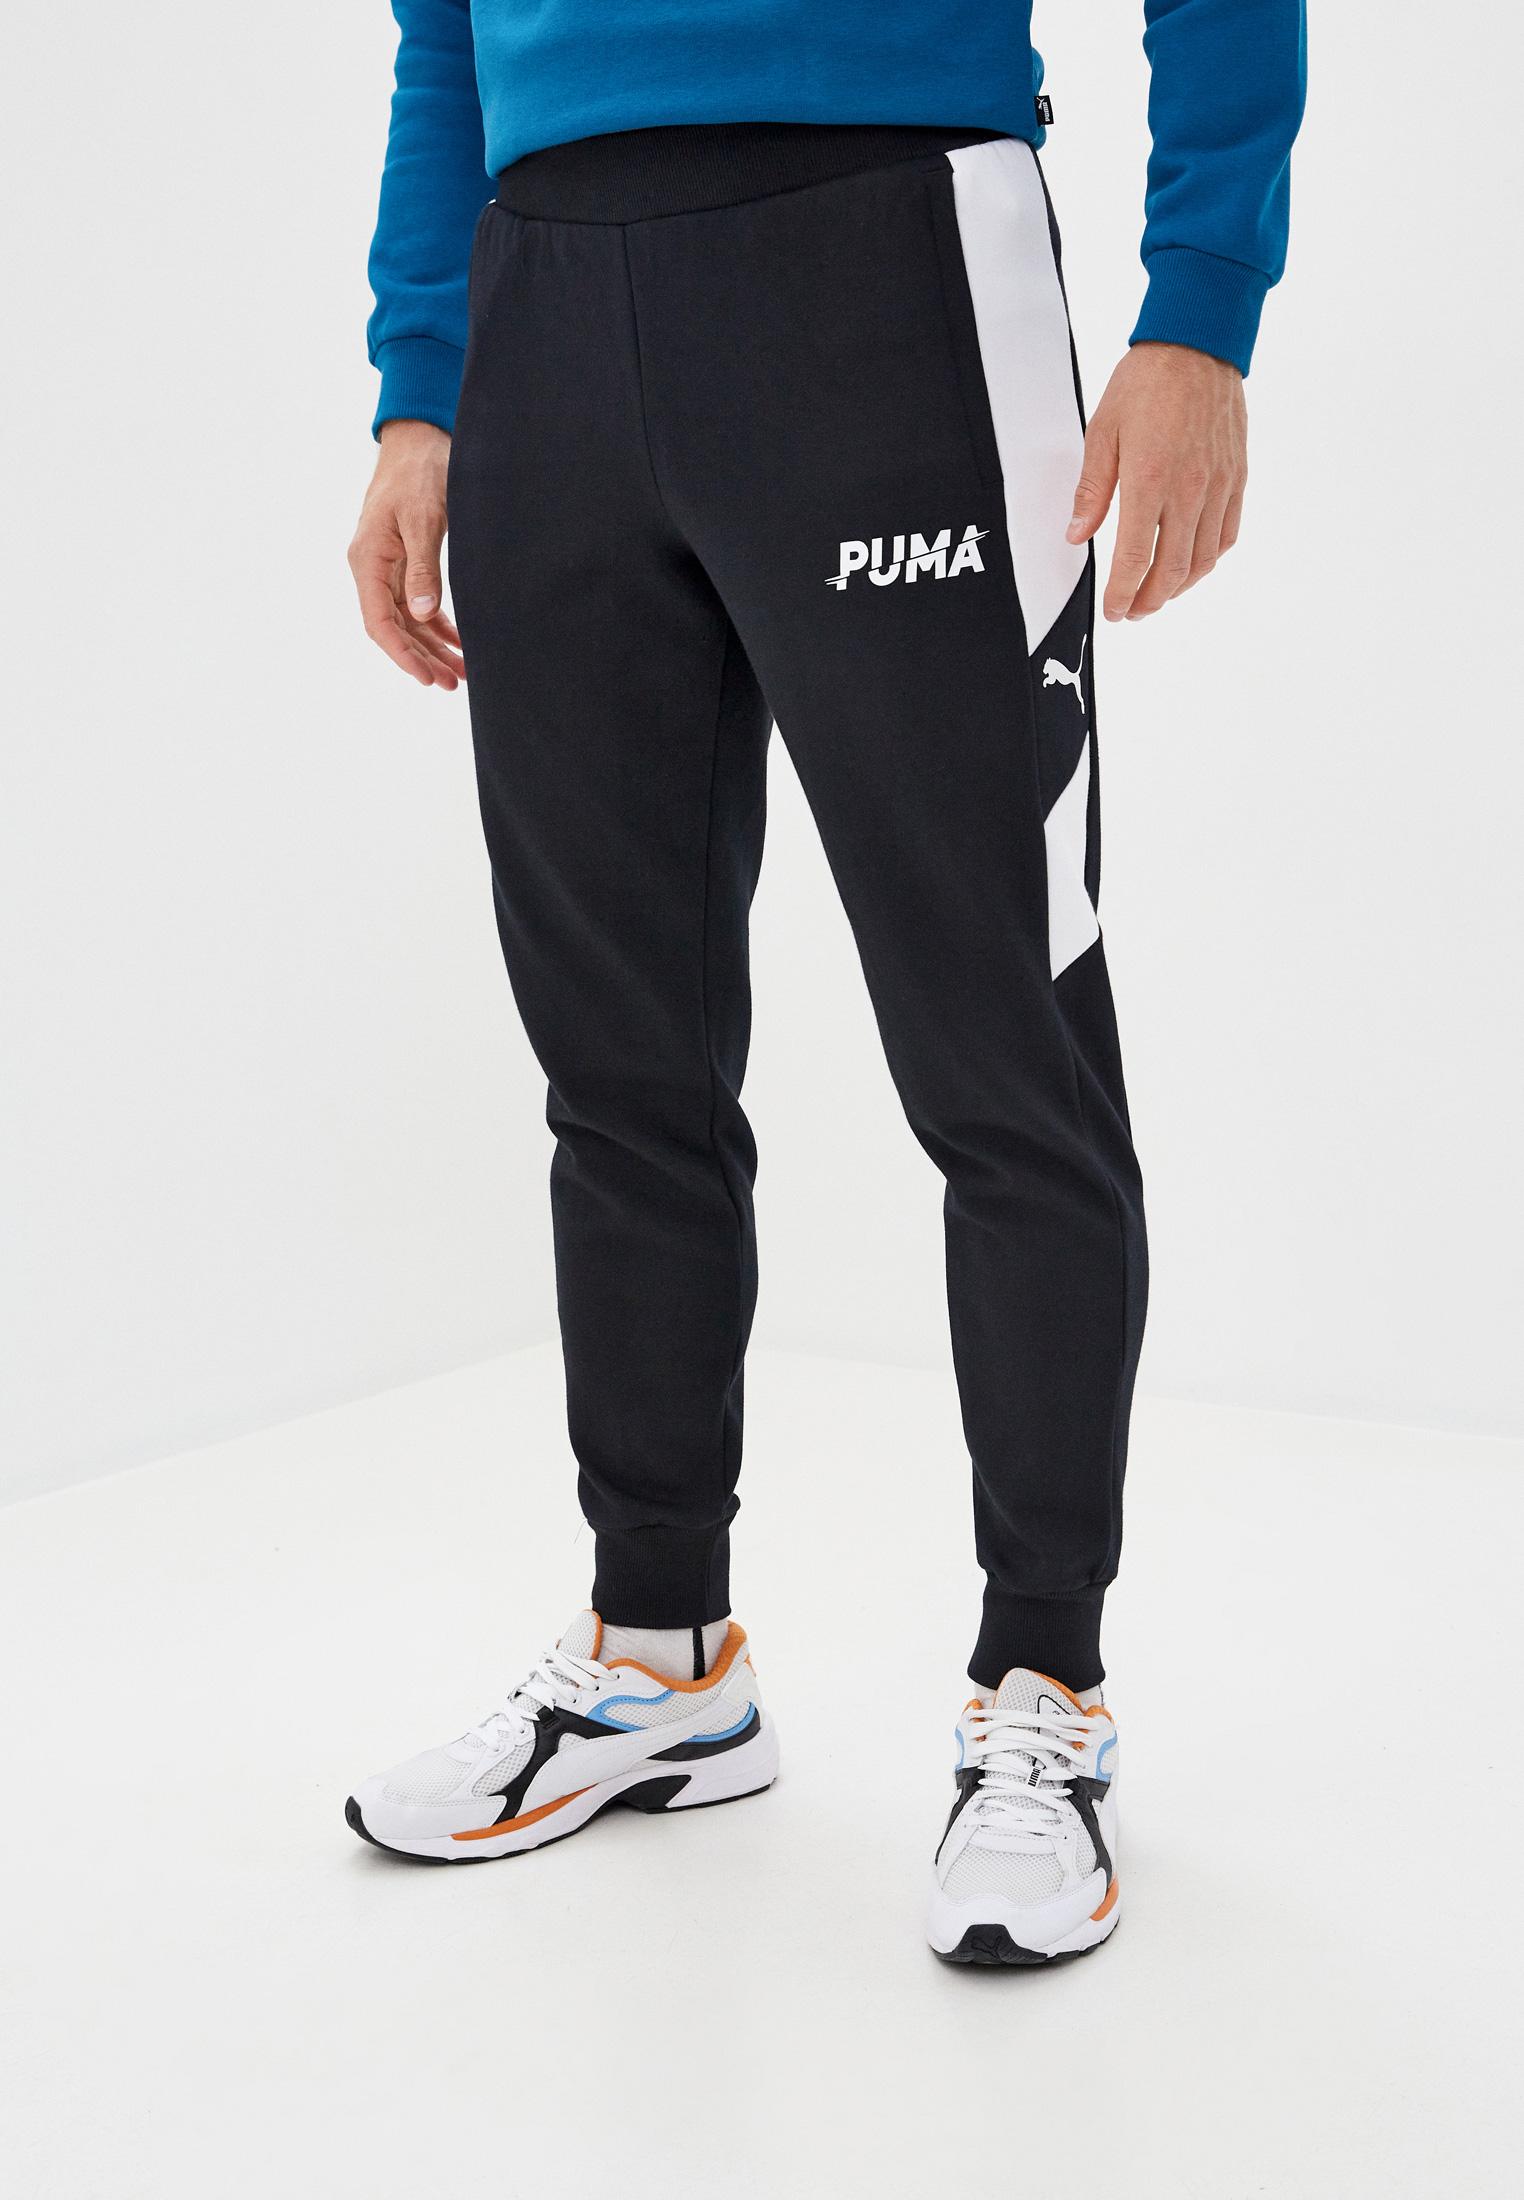 Брюки спортивные PUMA MODERN SPORTS Pants за 3 192 ₽. в интернет-магазине Lamoda.ru